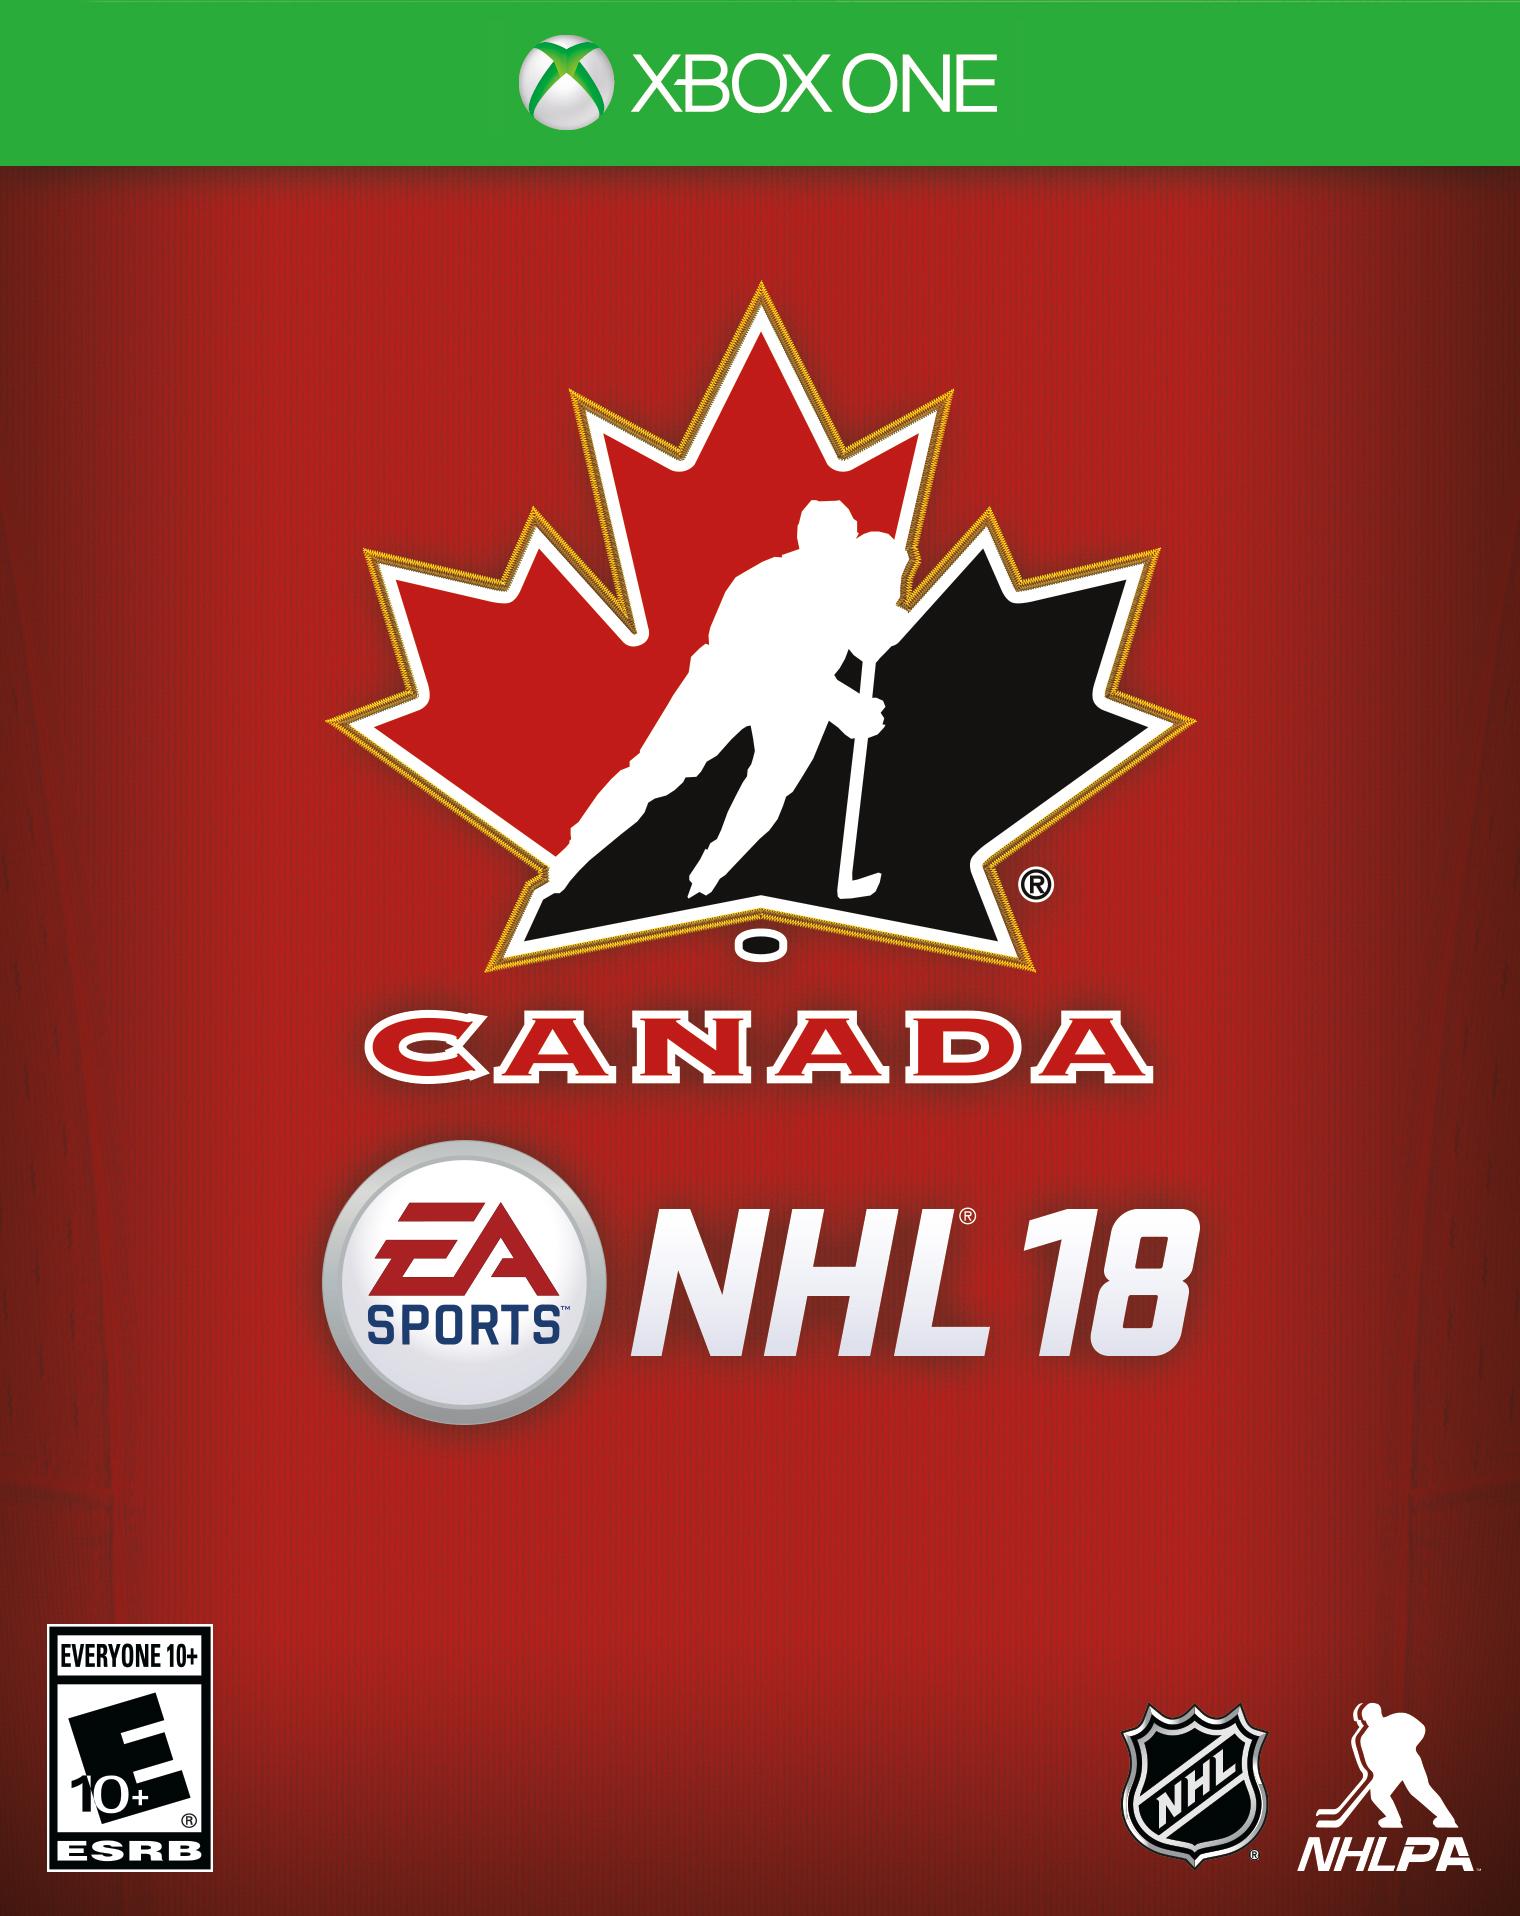 NHL18_HockeyCanada_XB1_Template_Bembroidery.jpg